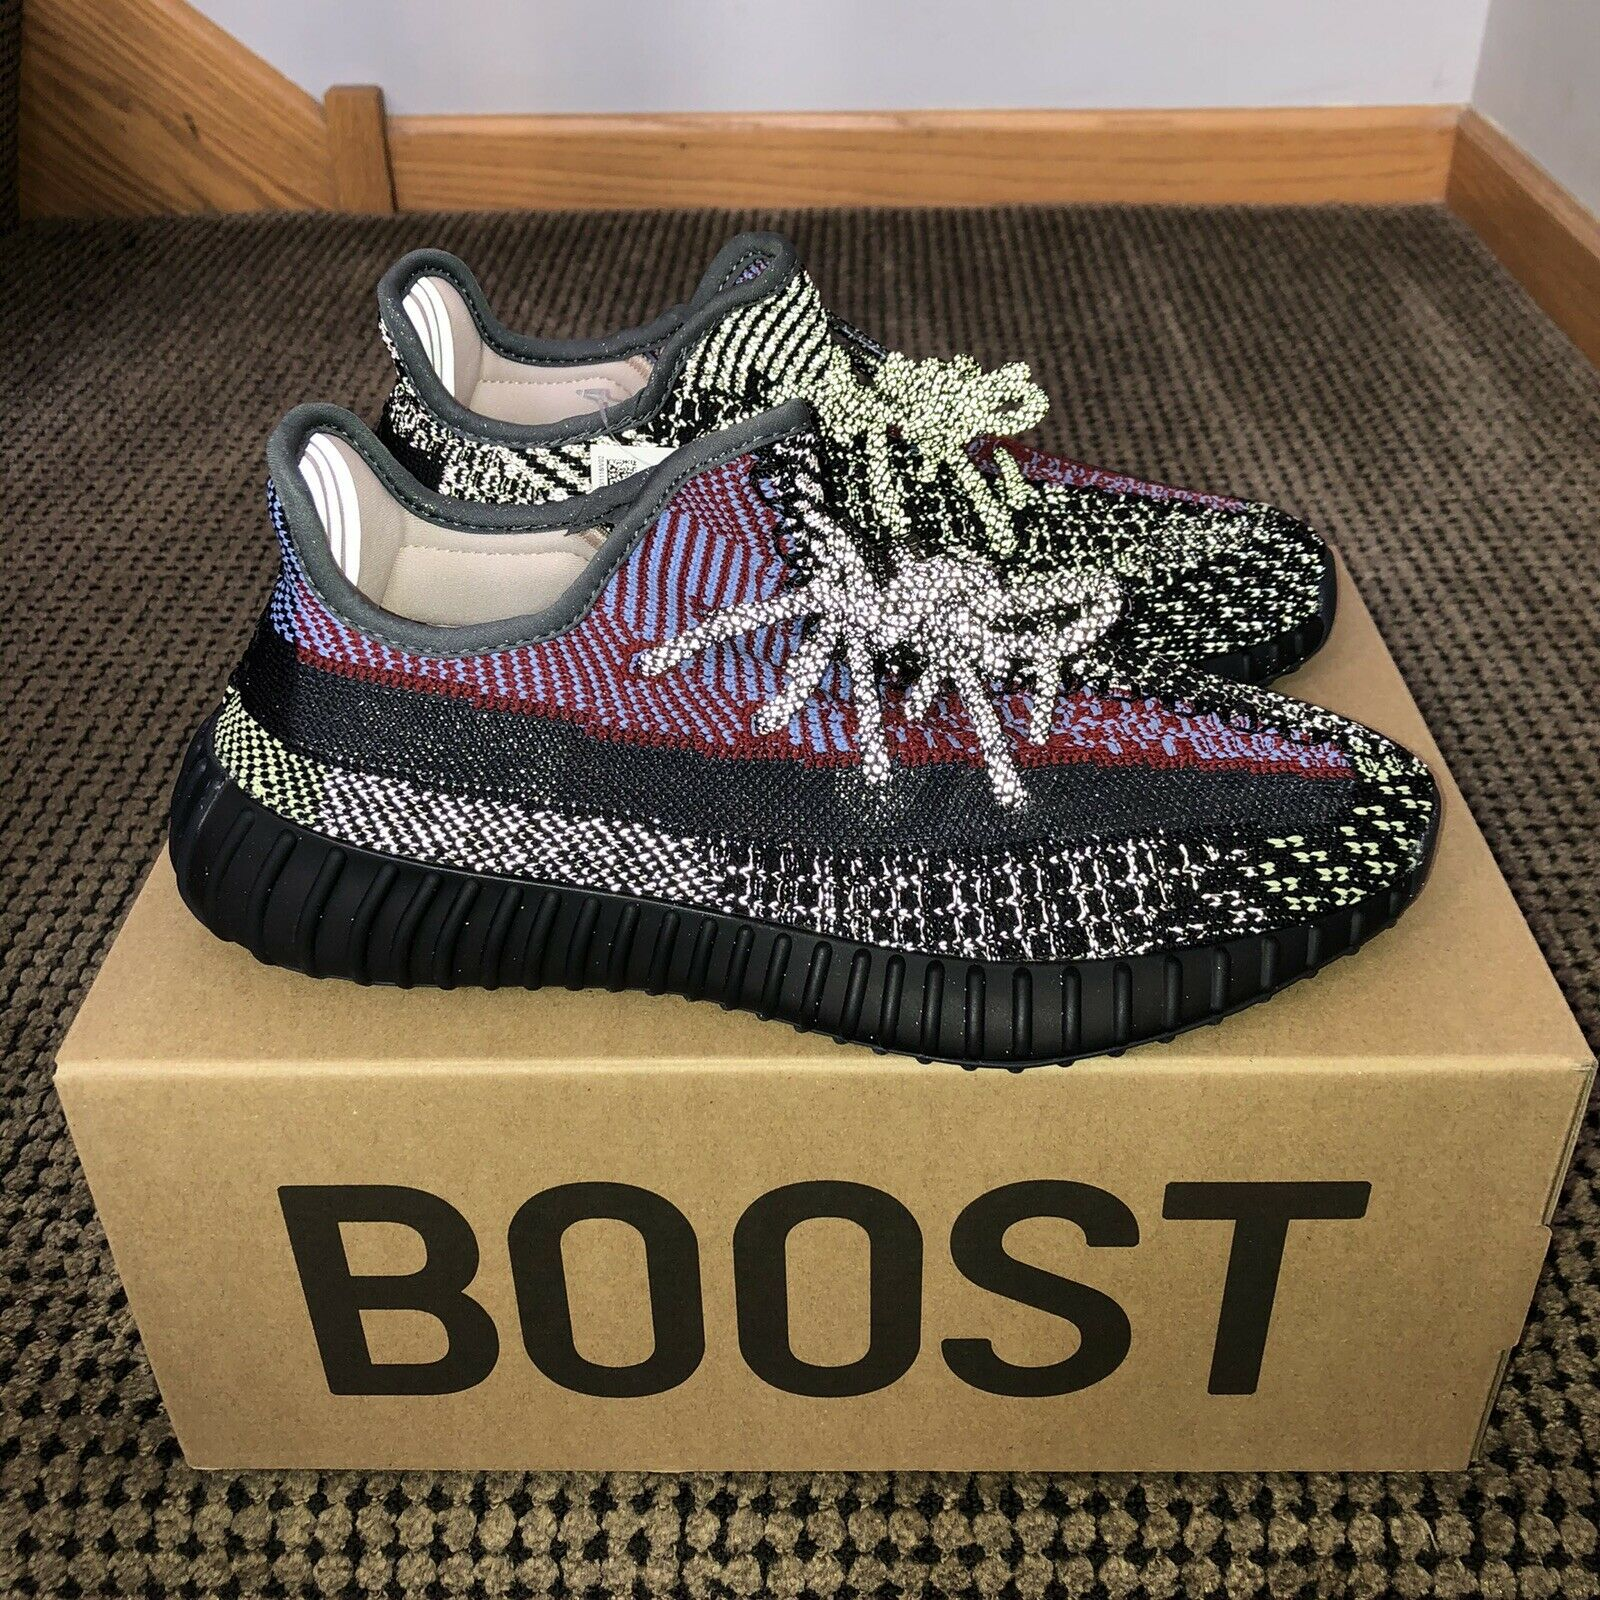 adidas Yeezy Boost 350 V2 Yecheil Infant